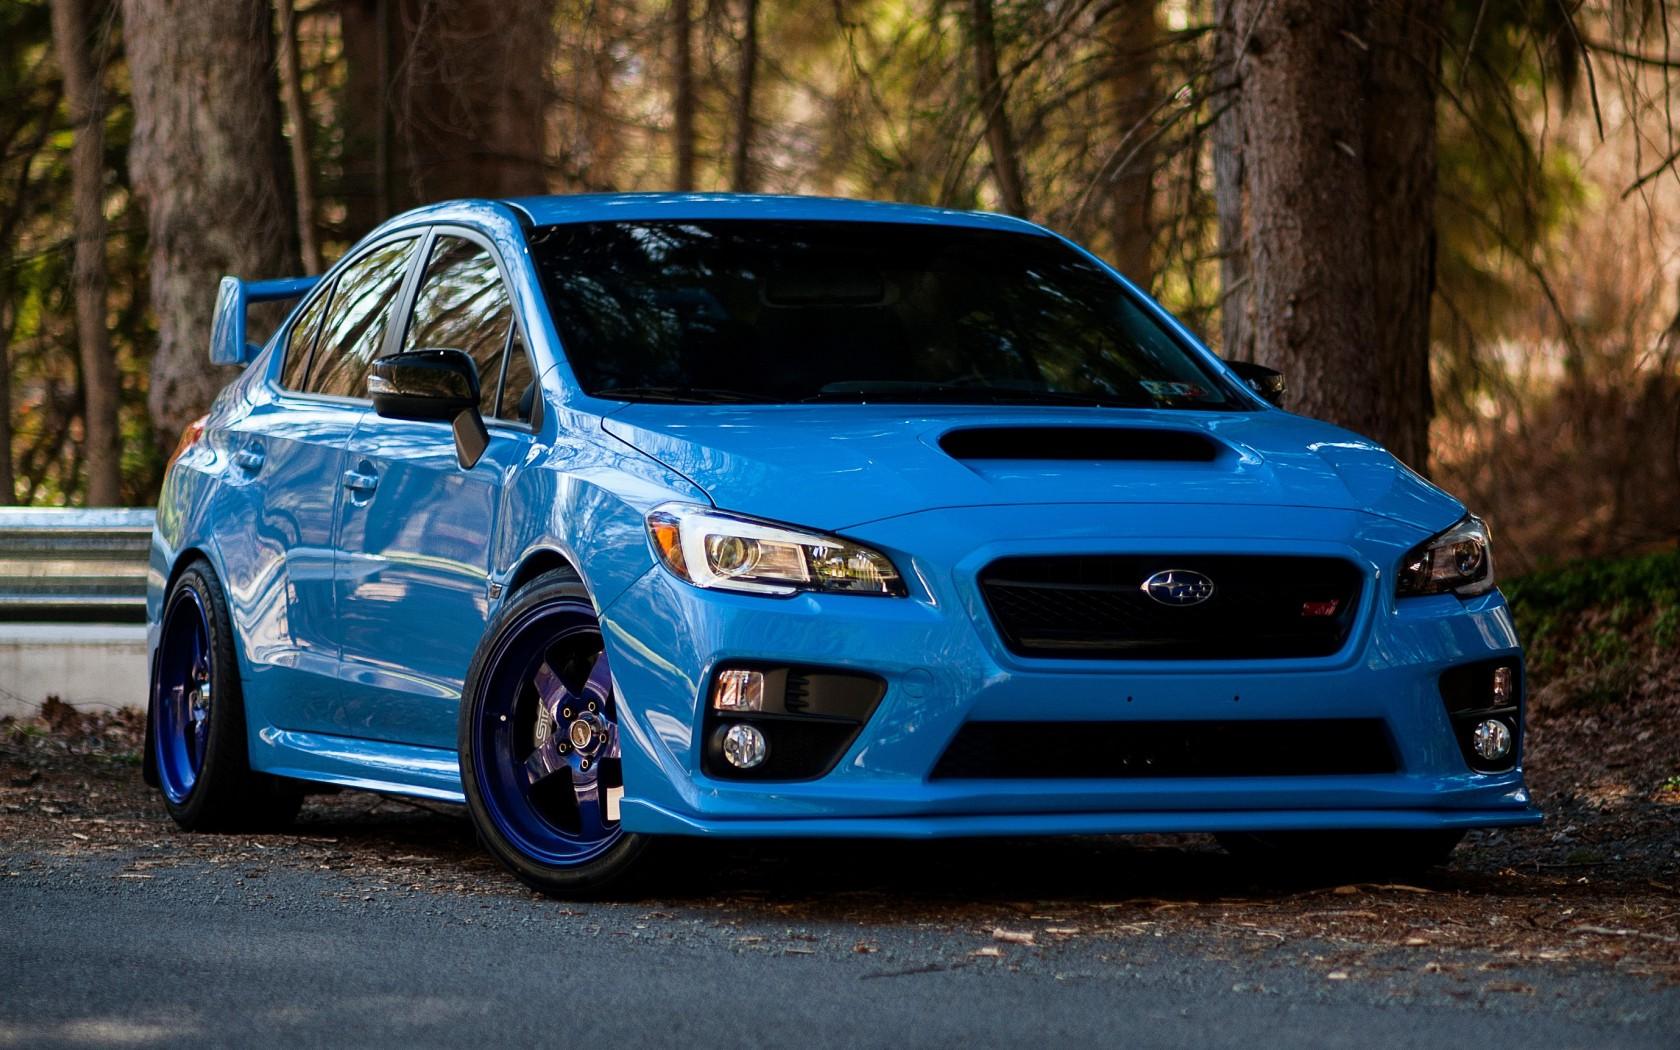 Wallpaper Blue Sports Car Subaru Impreza Wrx Sti Sedan Sti